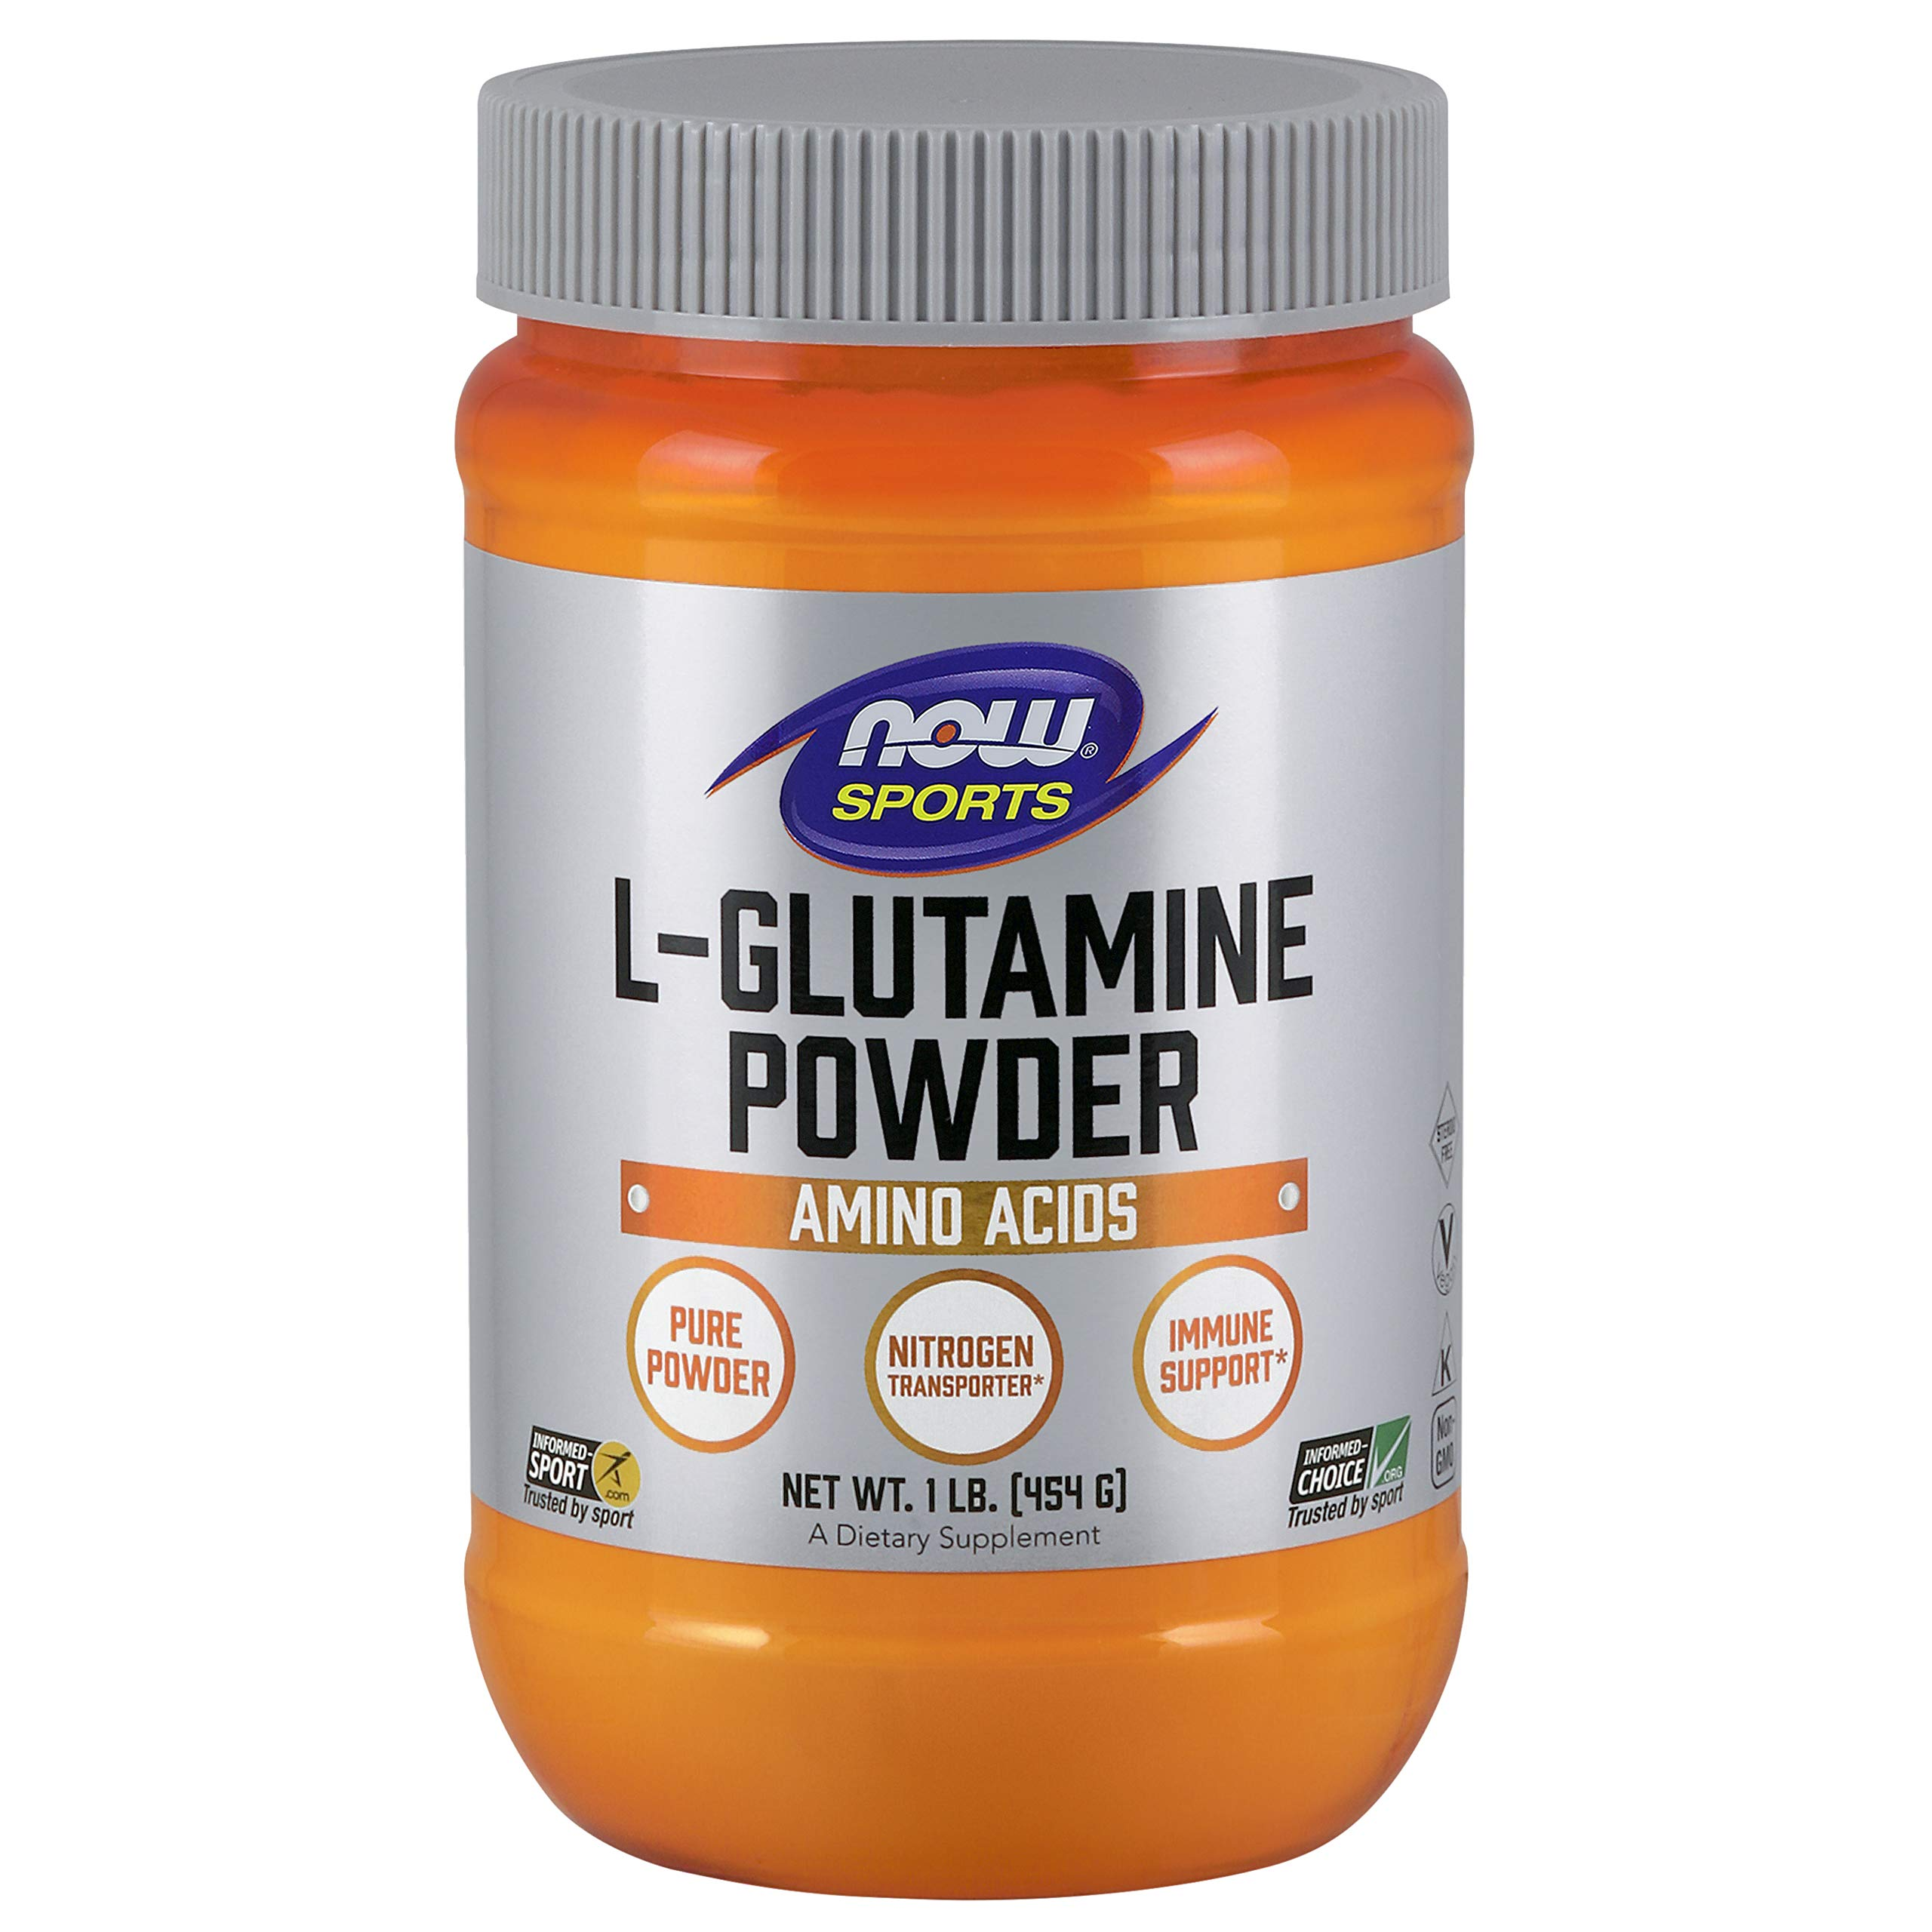 NOW Sports L Glutamine Powder 1 Pound